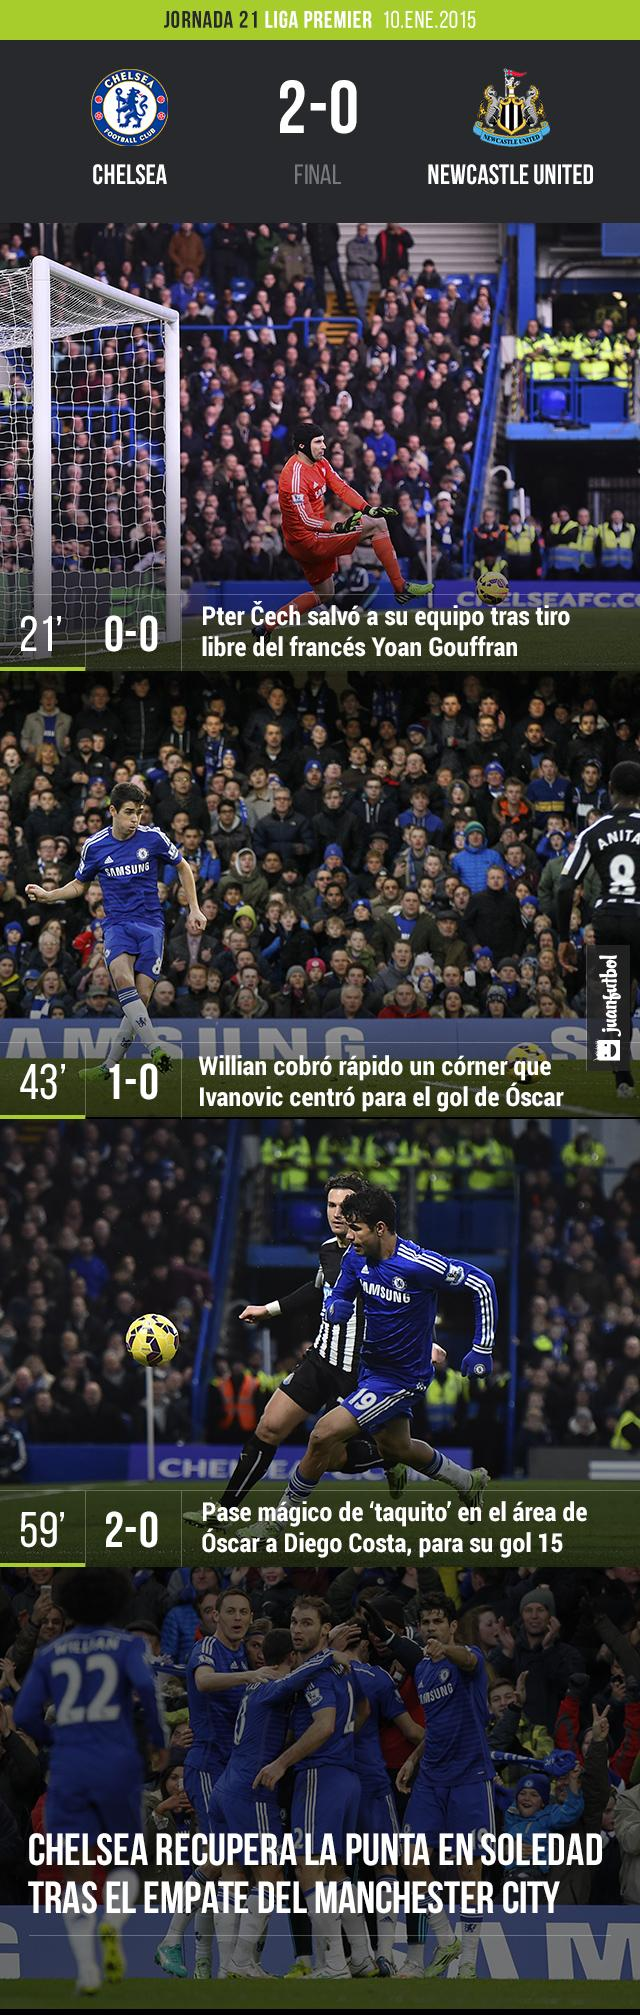 Chelsea vs. Newcastle United